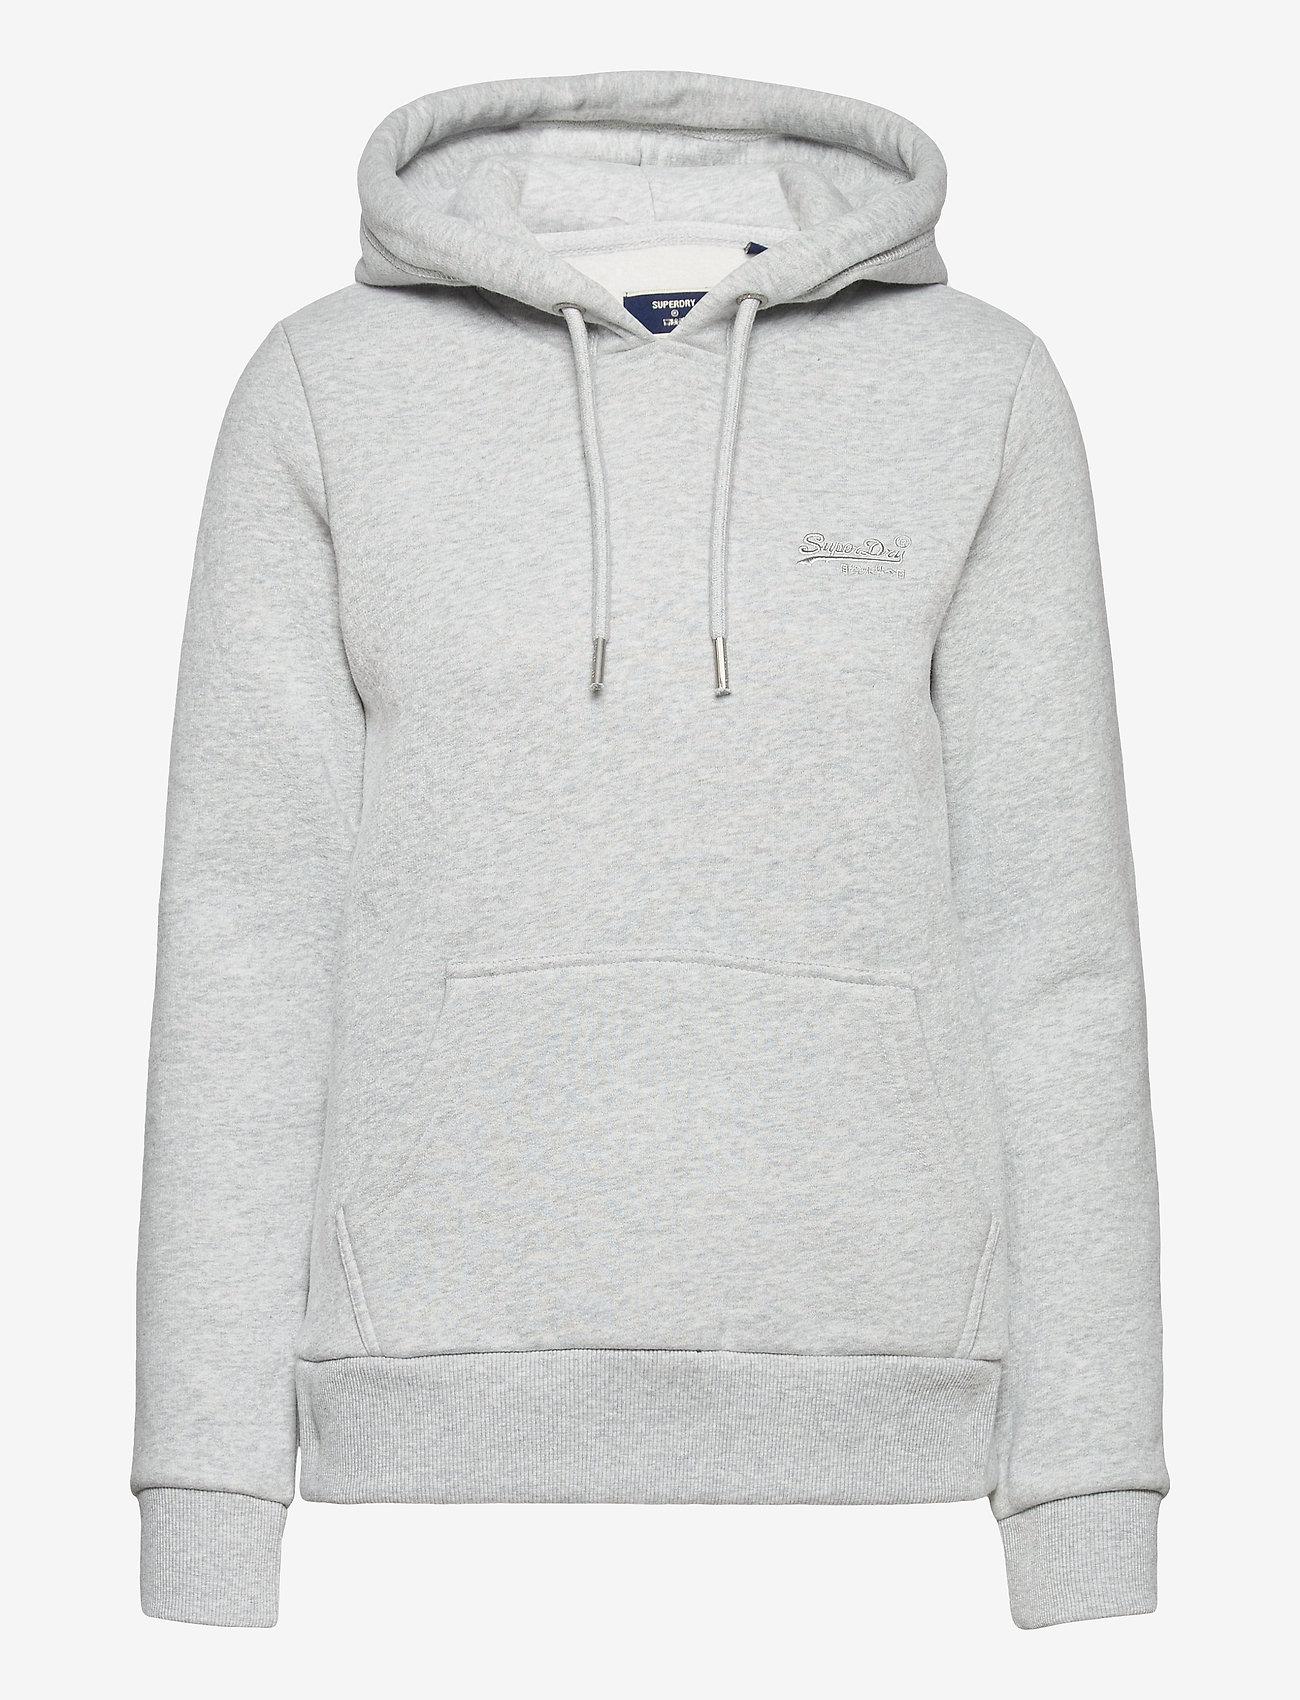 Superdry - OL CLASSIC HOOD BB - hoodies - light grey marl - 0